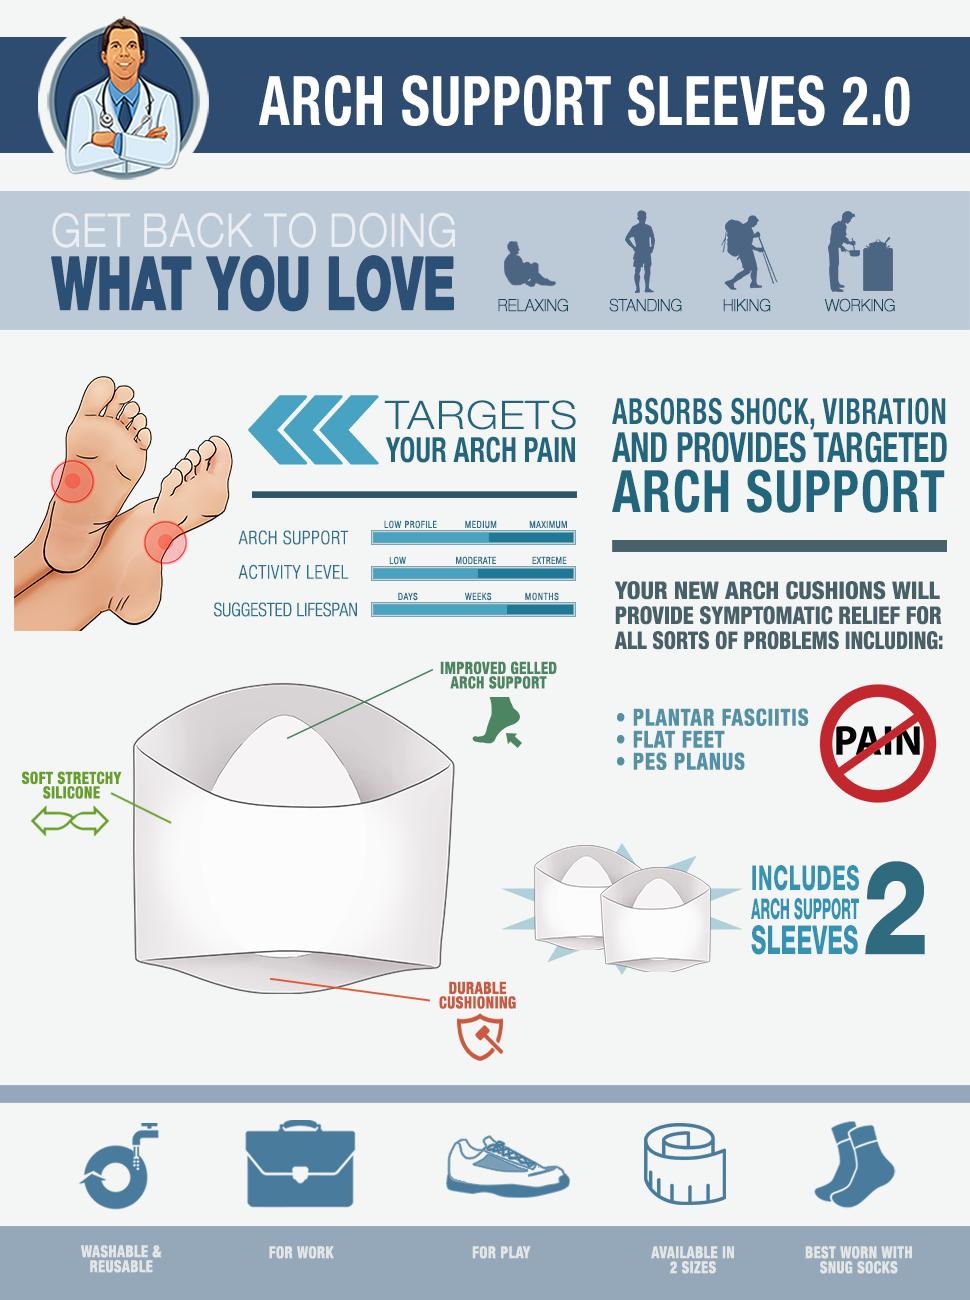 achiles arch bands brace compression fasciitis fascitis feet flat foot heel high insert inserts